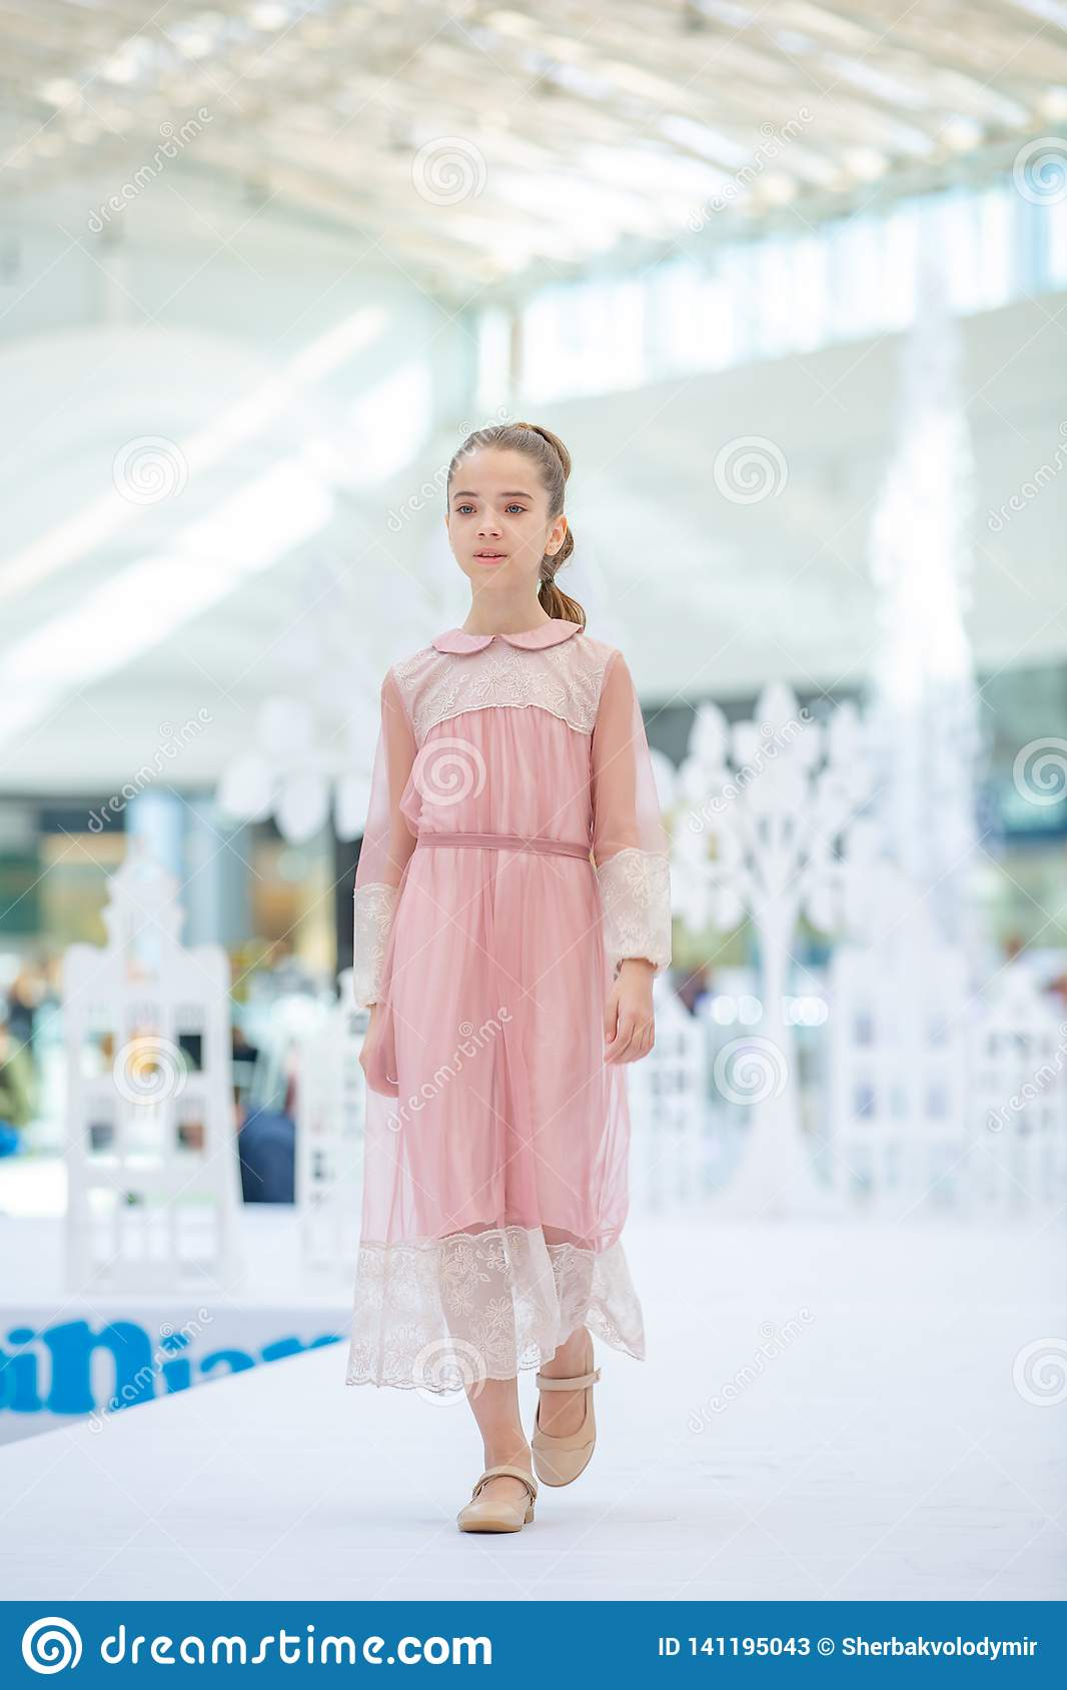 Kyiv, Ukraine March 03.2019. UKFW. Ukrainian Kids Fashion Day. Little girl wearing at pastel dress